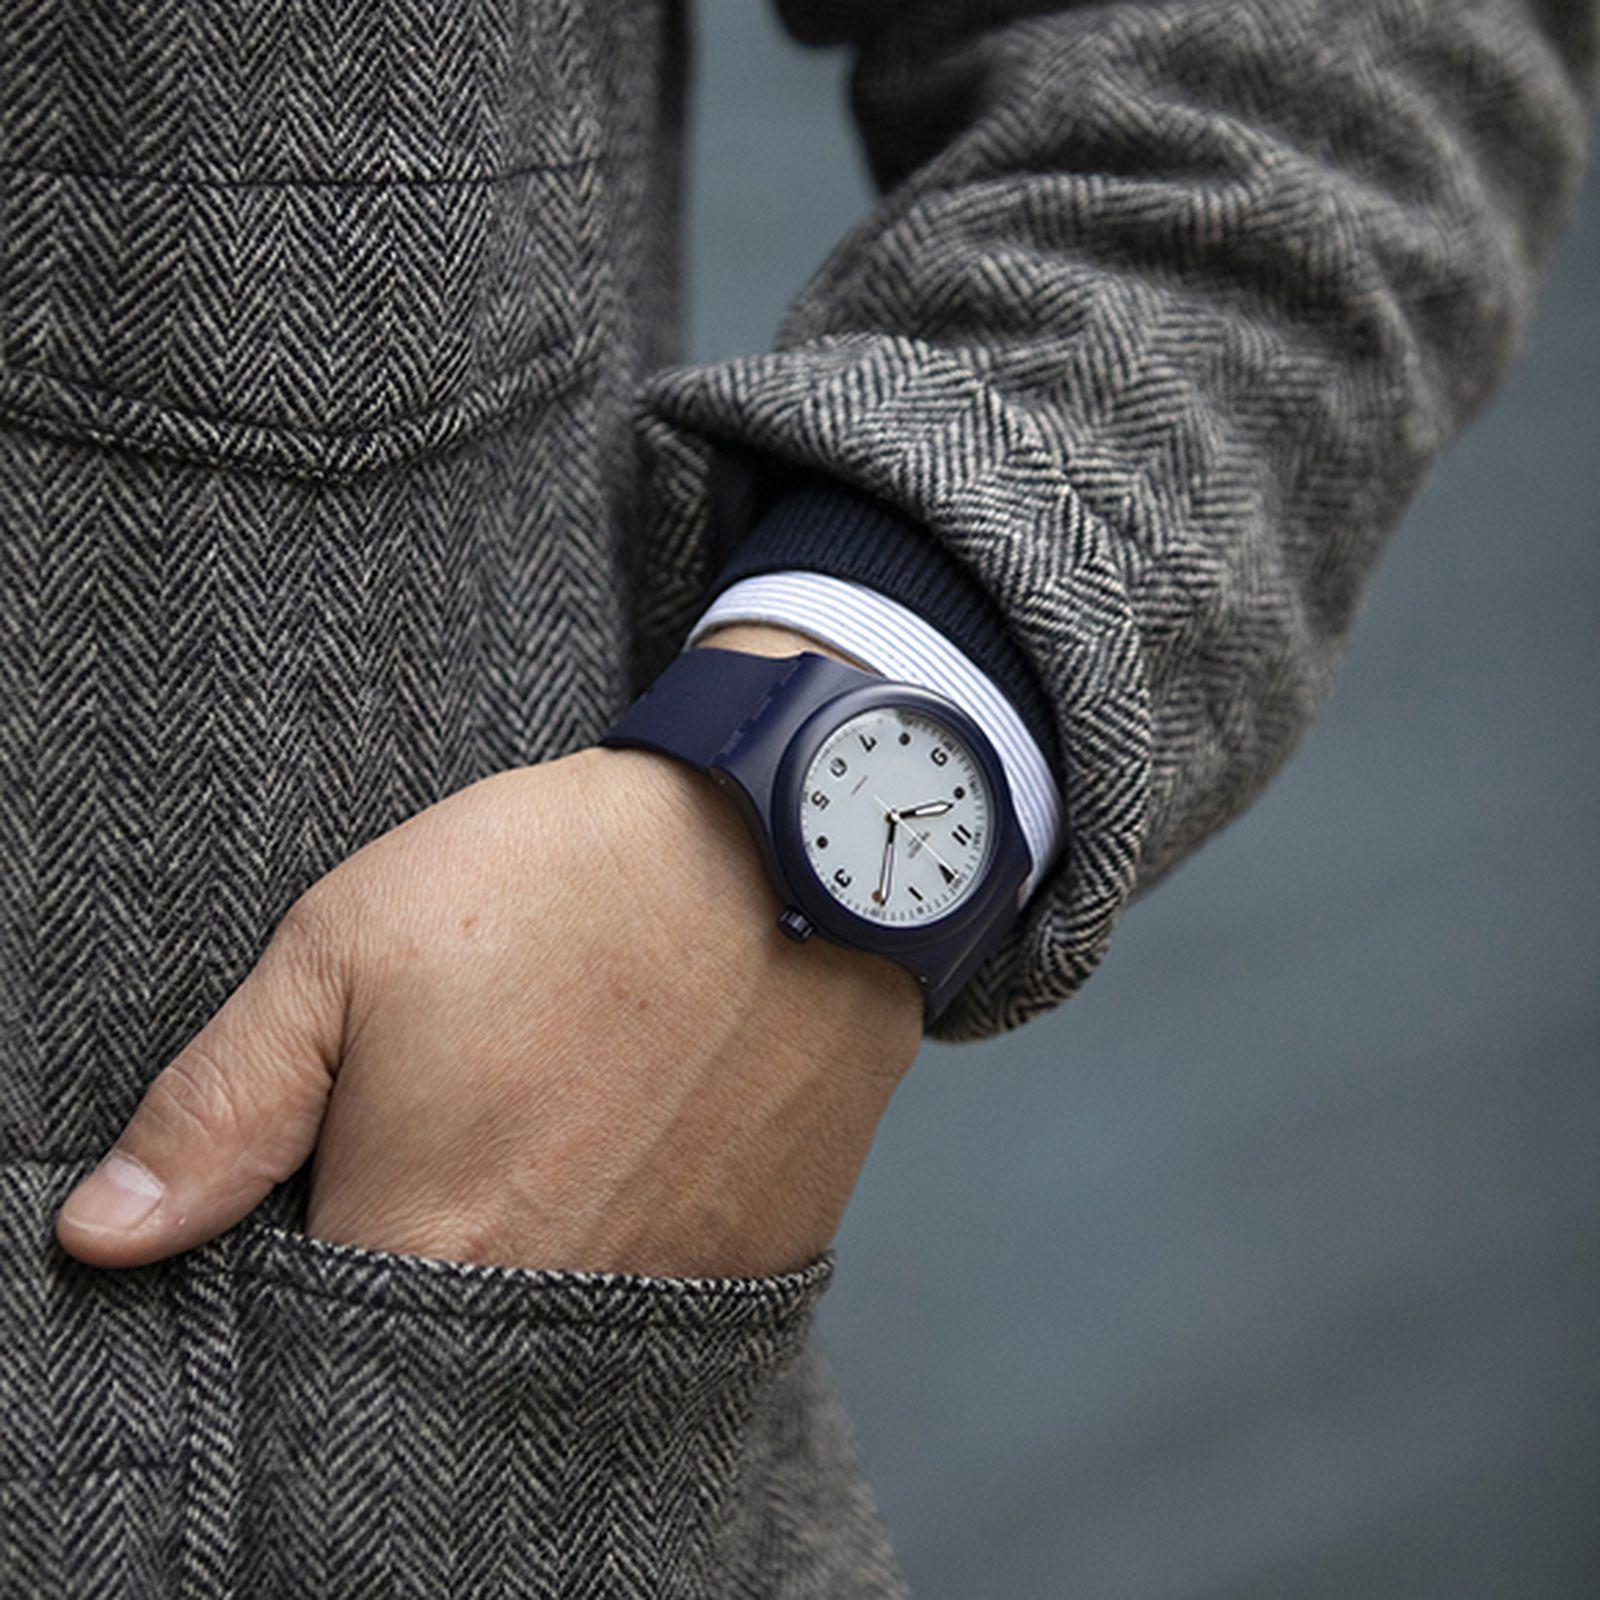 hodinkee swatch sistem51 blue edition watch